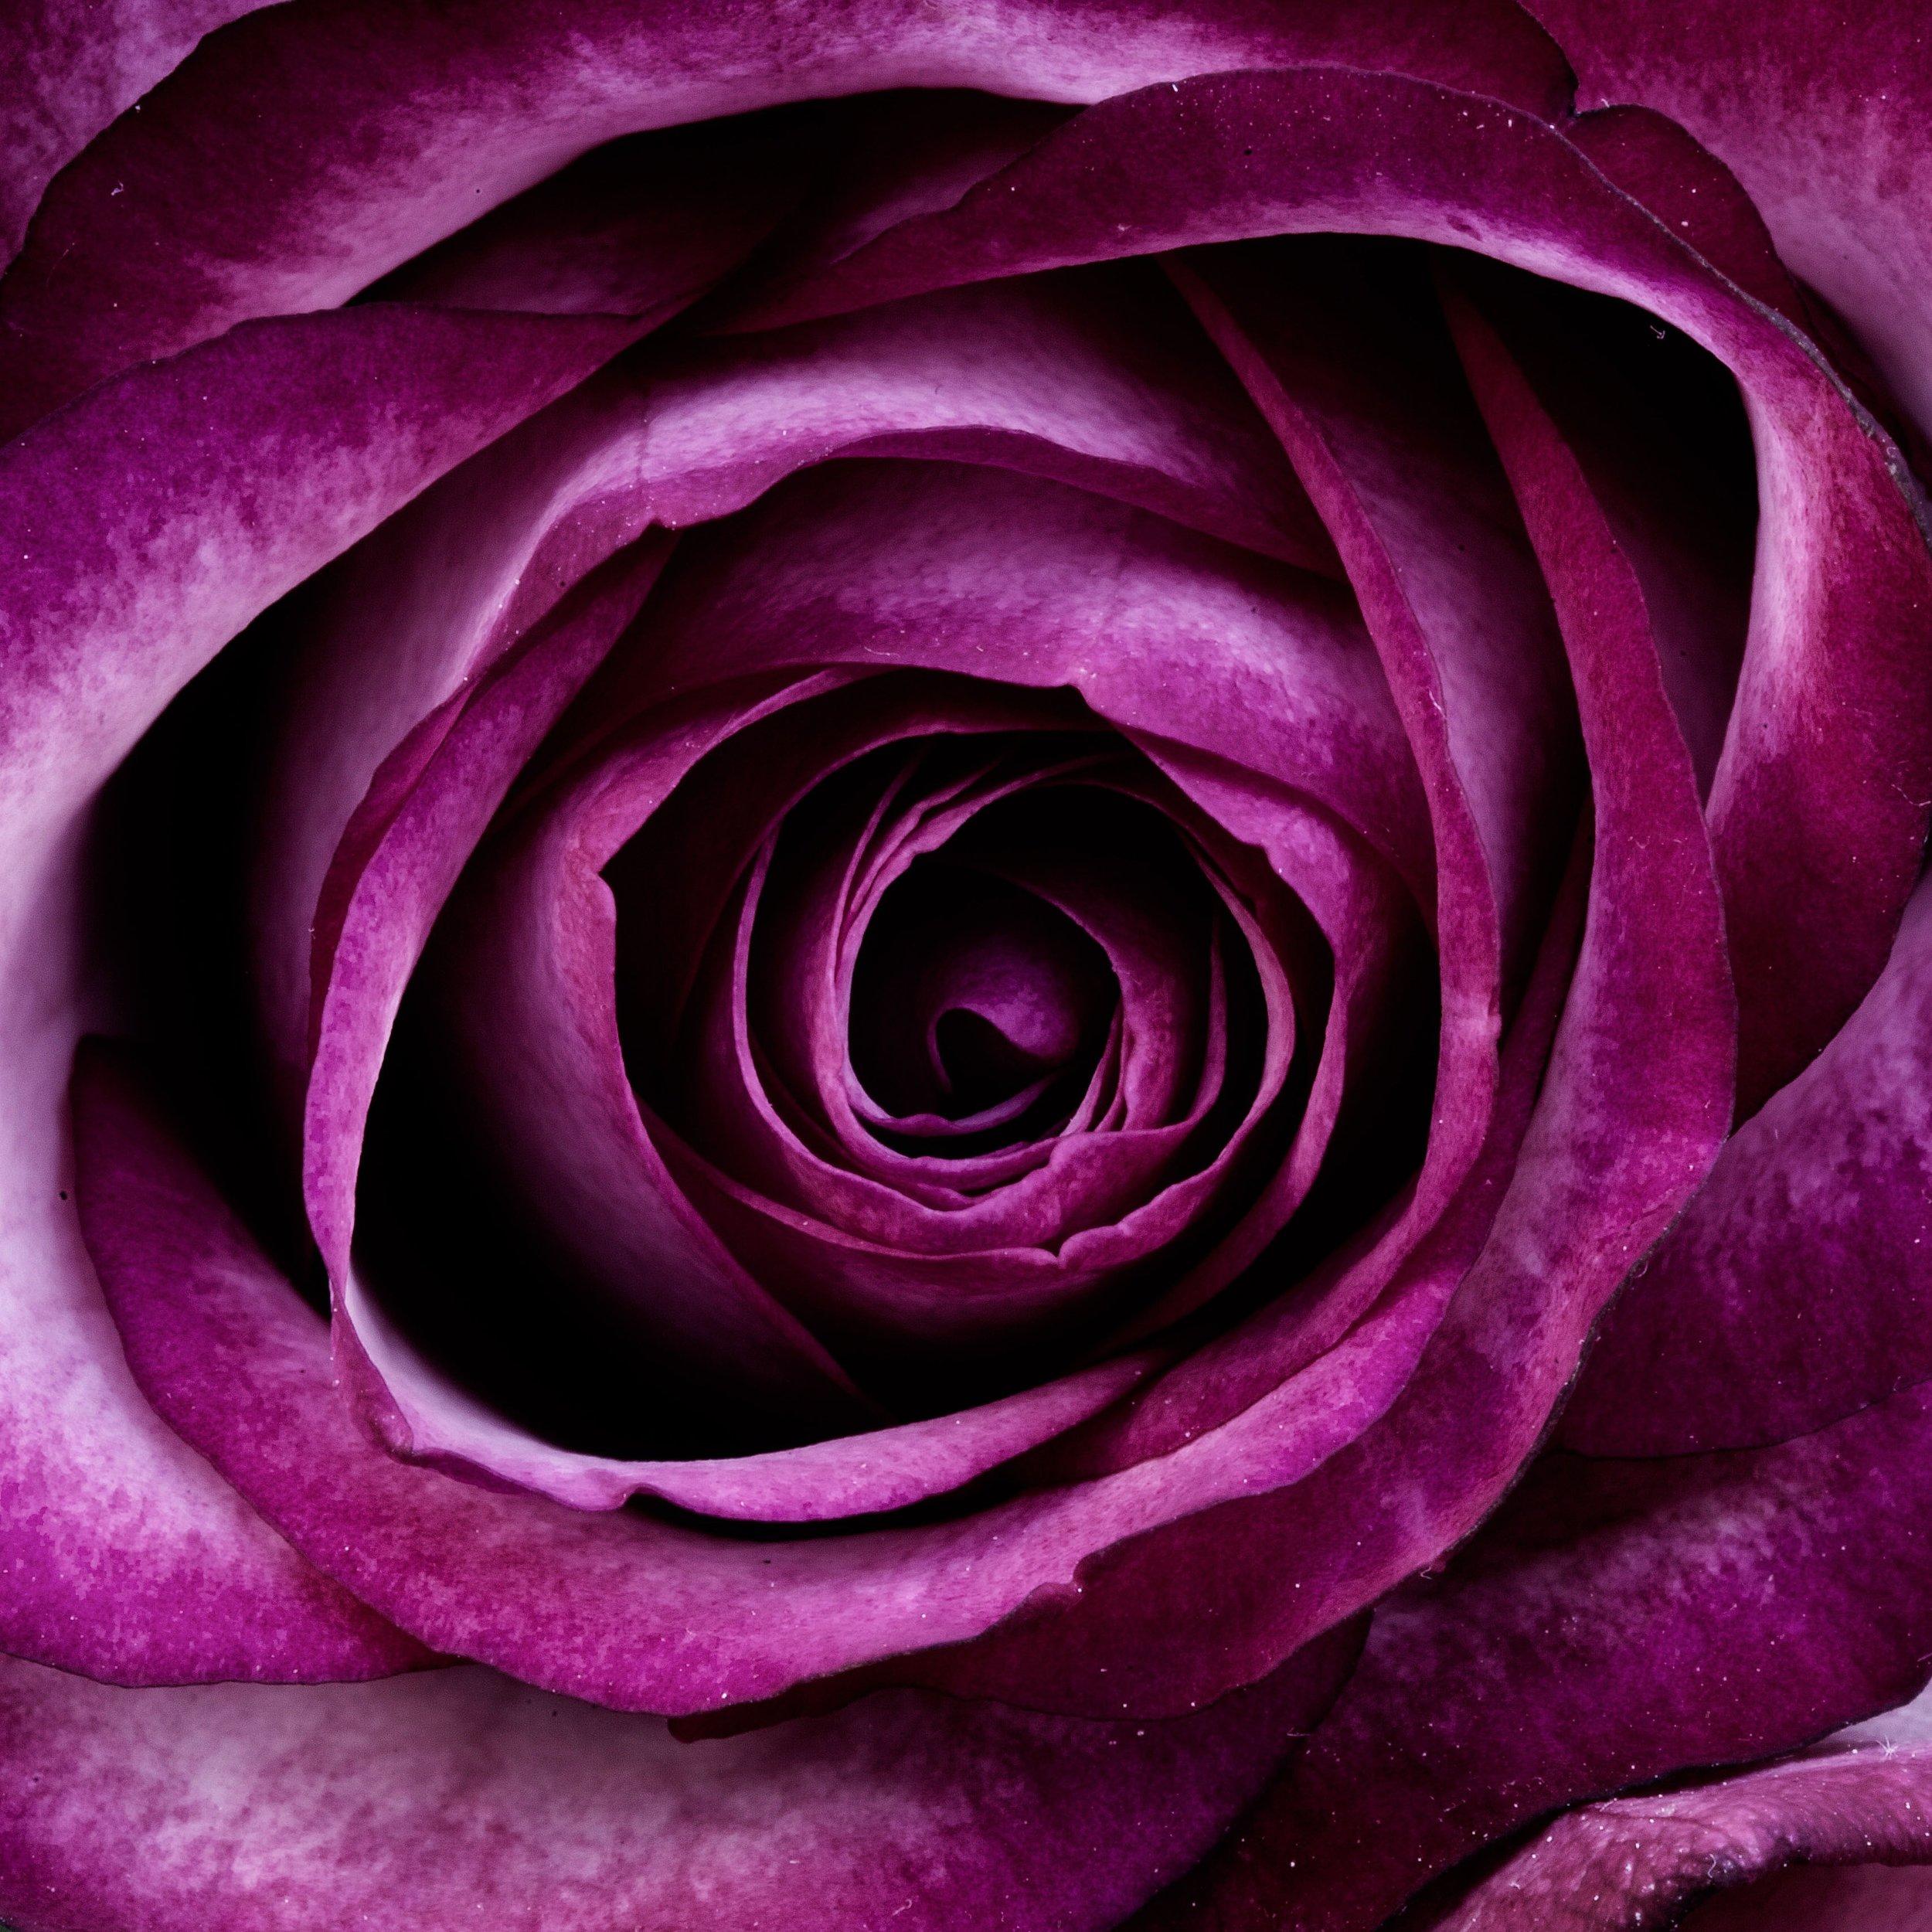 bloom-blossom-close-up-65232.jpg